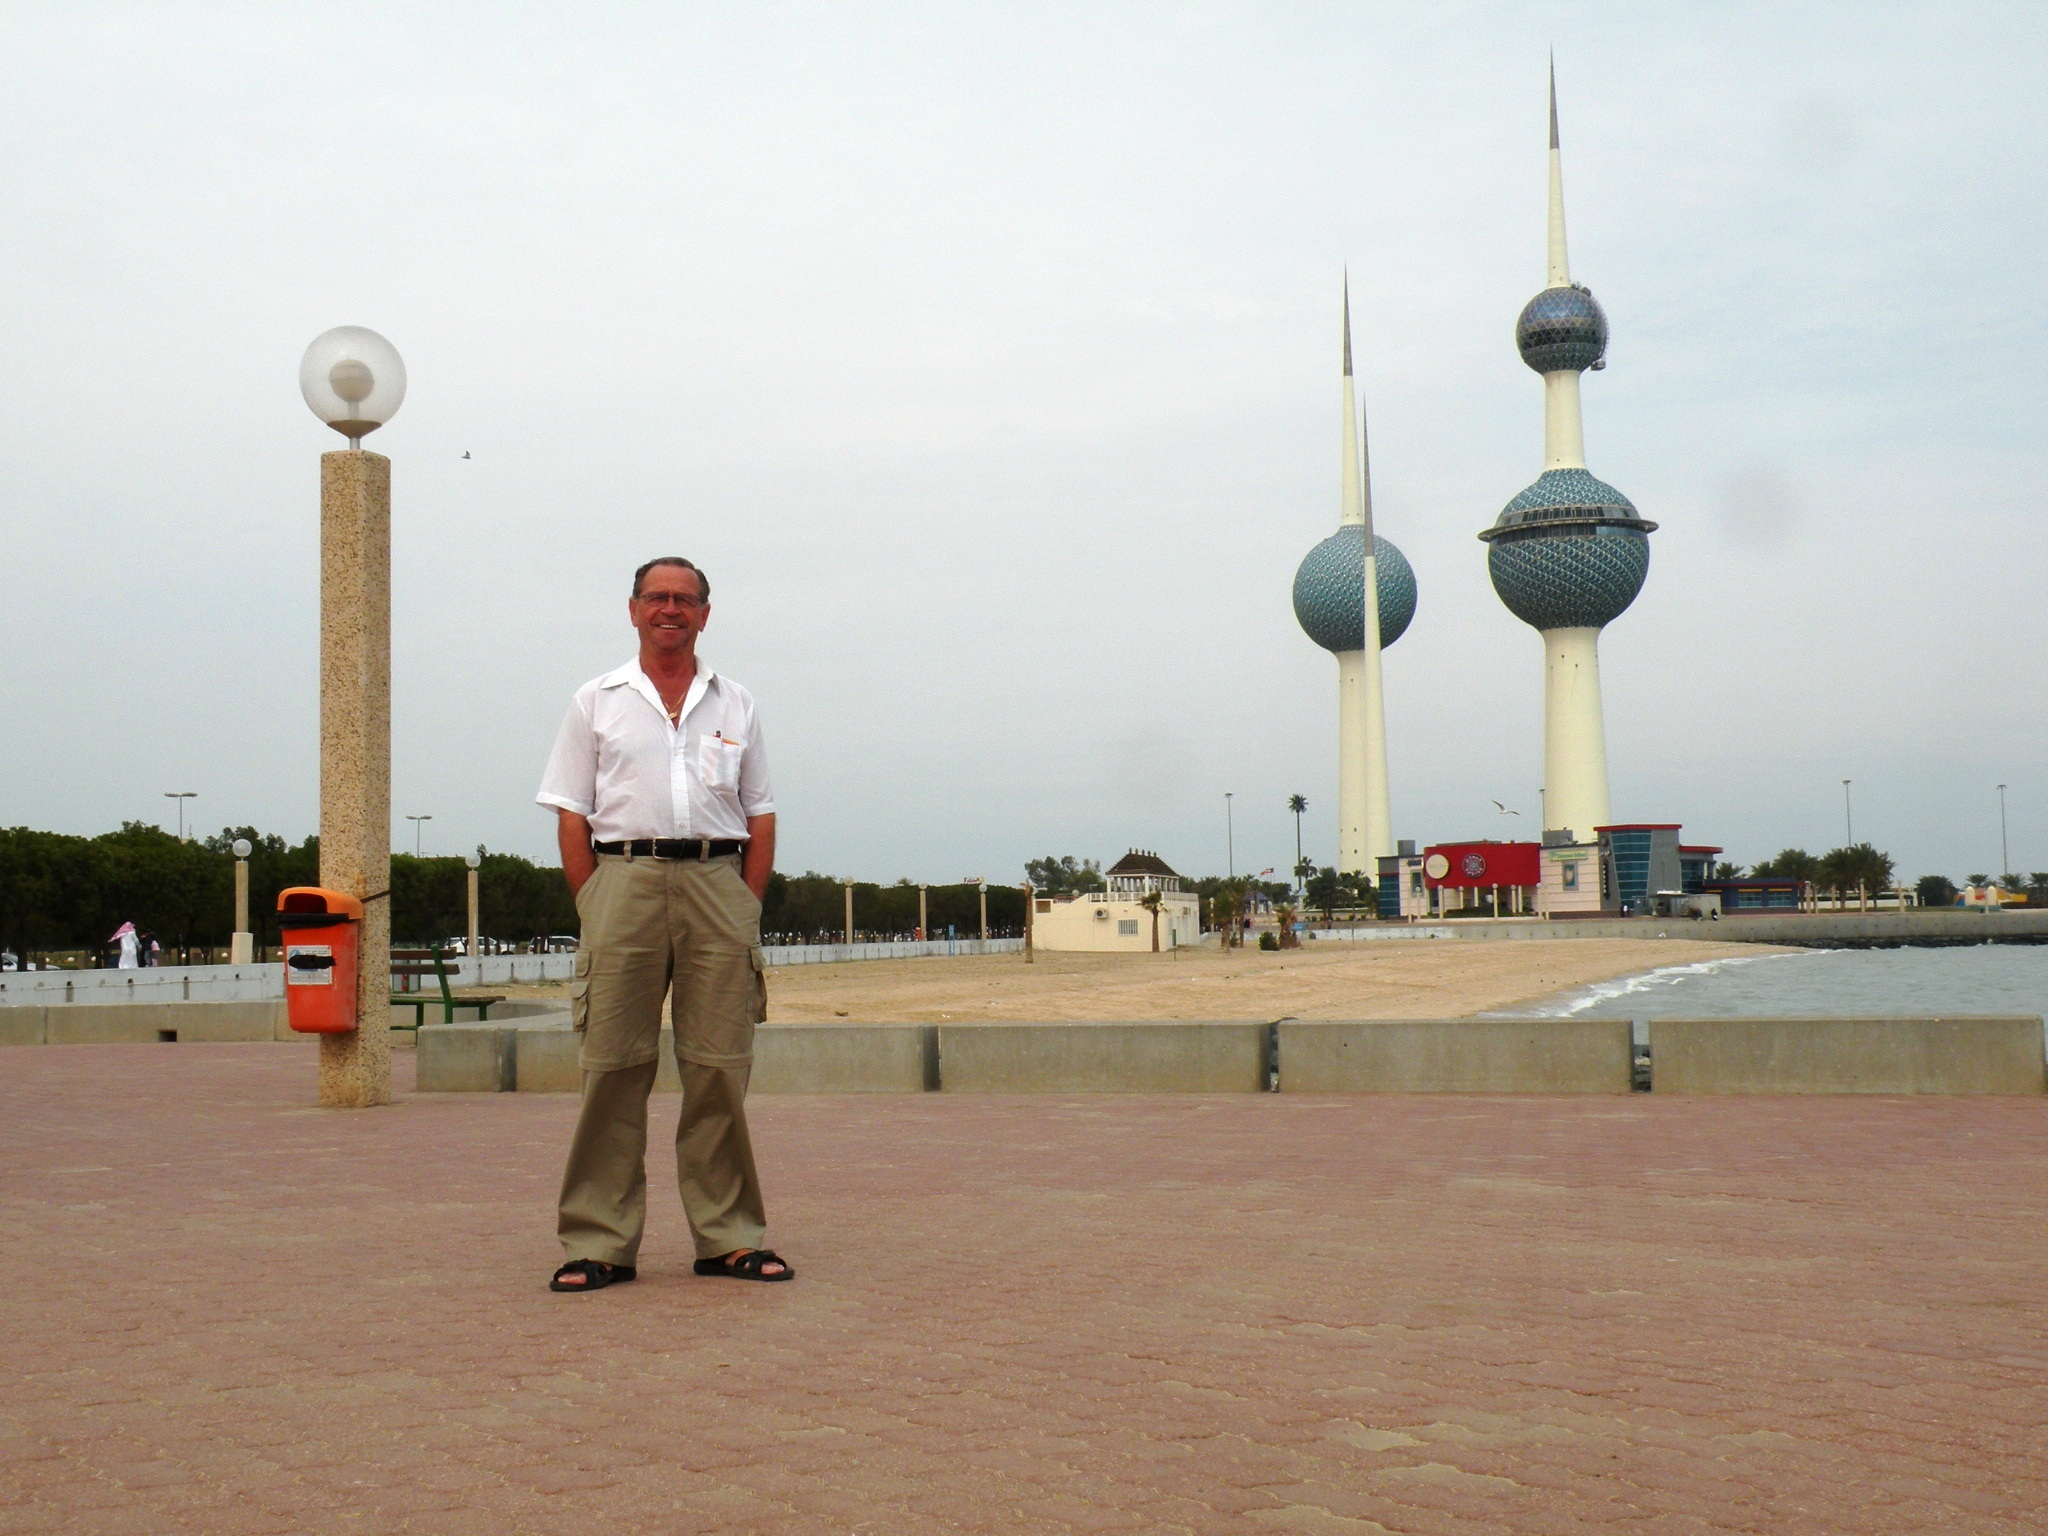 Gerry Klappe